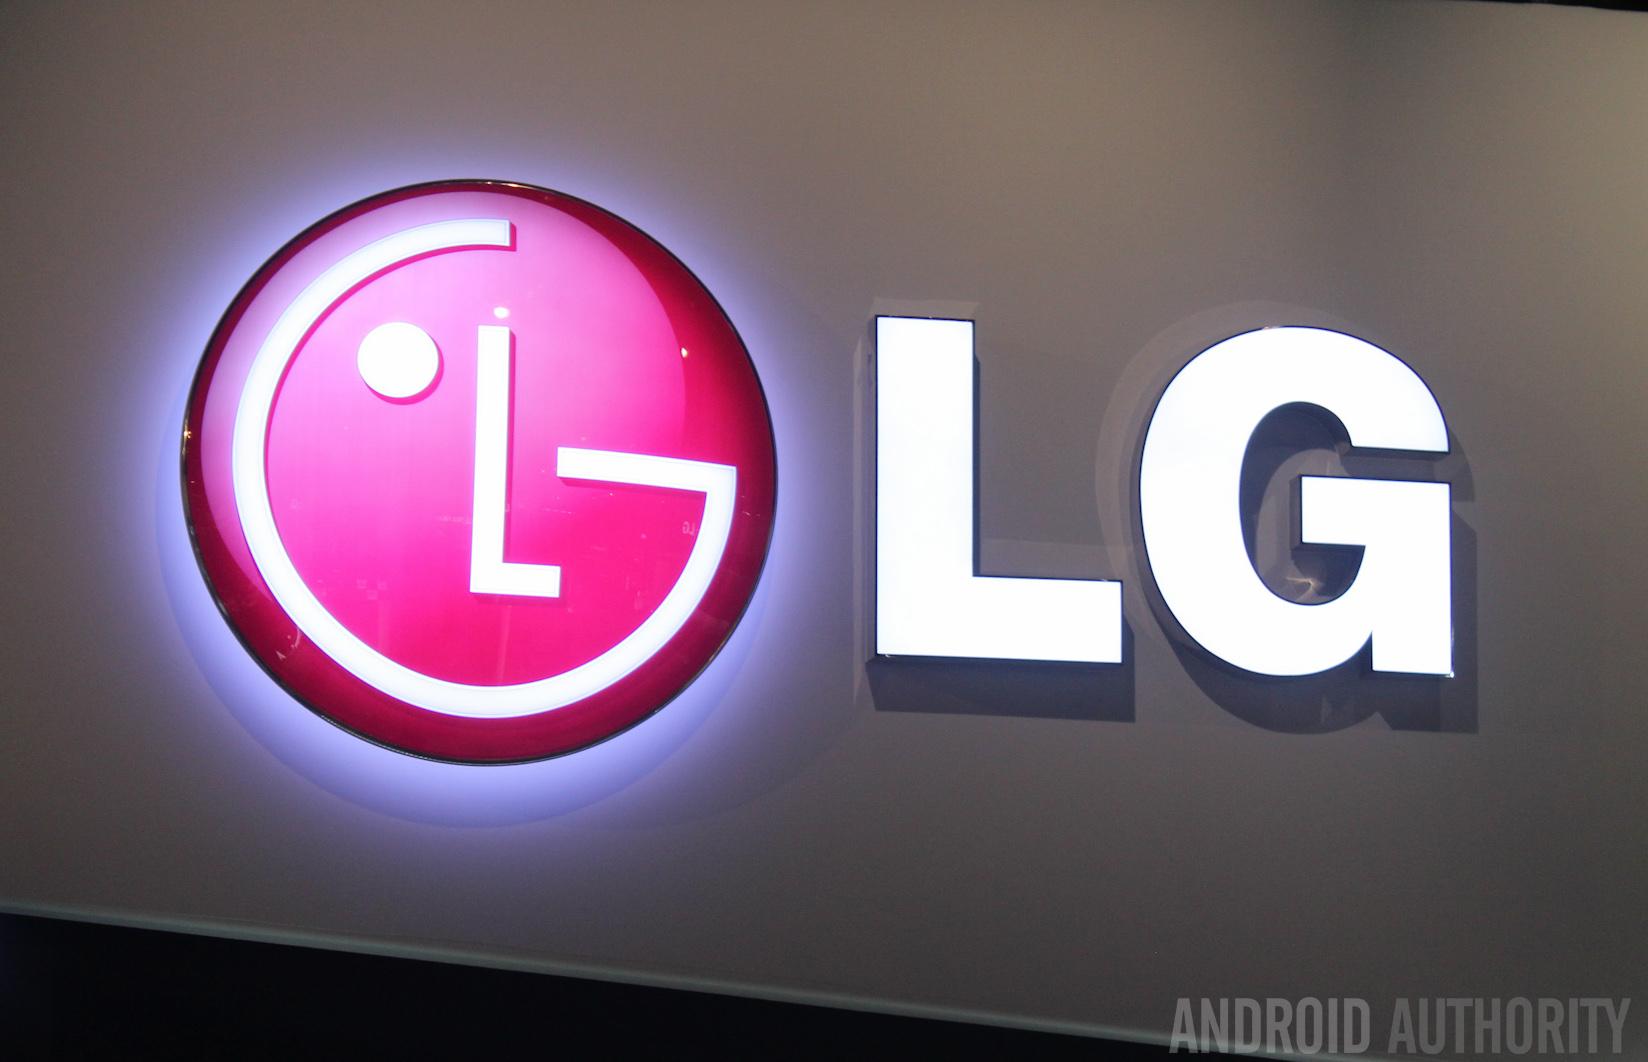 Google's new favorite OEM: The LG story